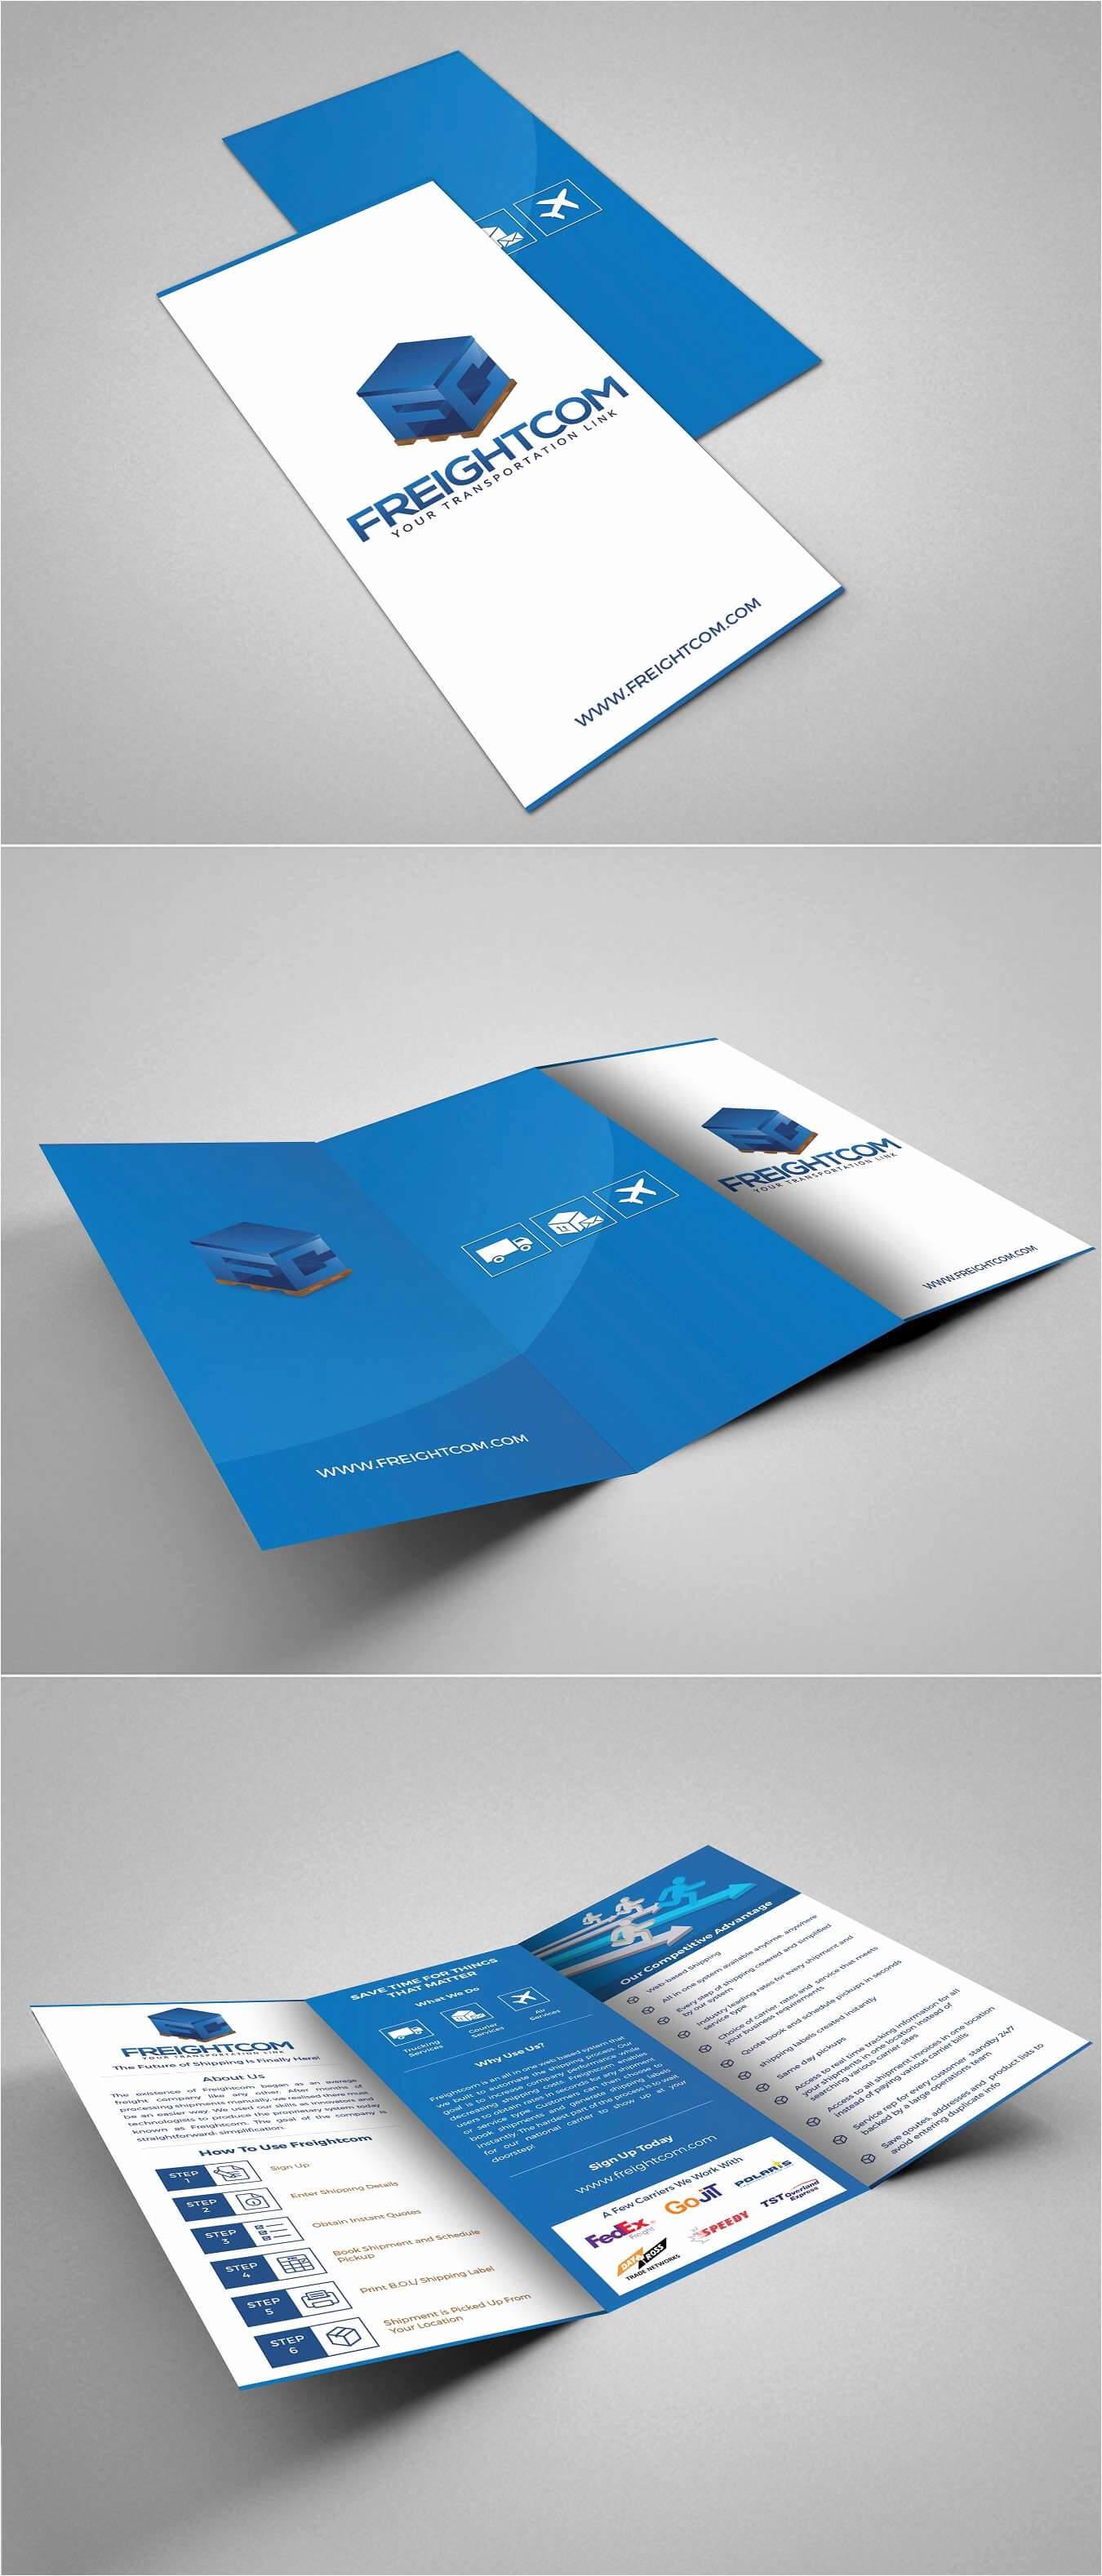 Kinkos Business Card Template Download Fedex Online Cards For Kinkos Business Card Template